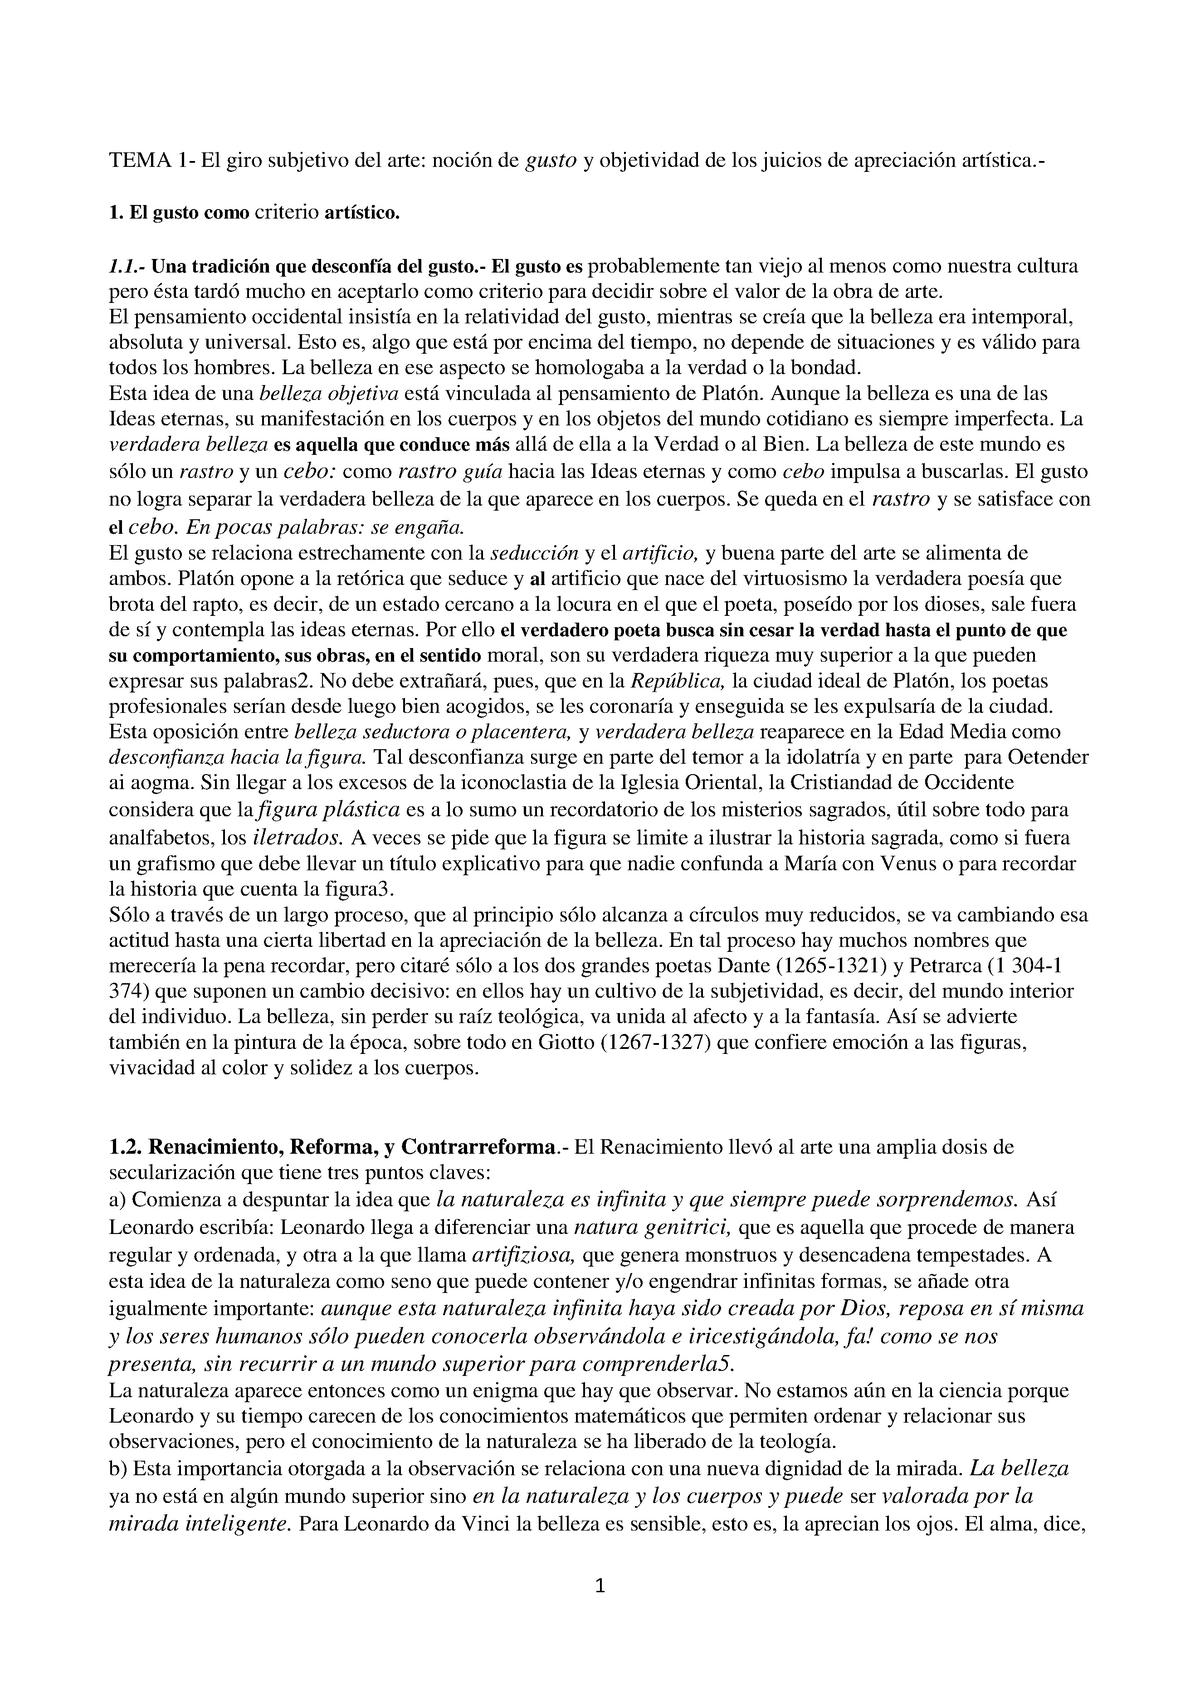 Apuntes Estética Juan Bosco Y Mj Godoy - 1670018: Historia de las Ideas  Estéticas - StuDocu